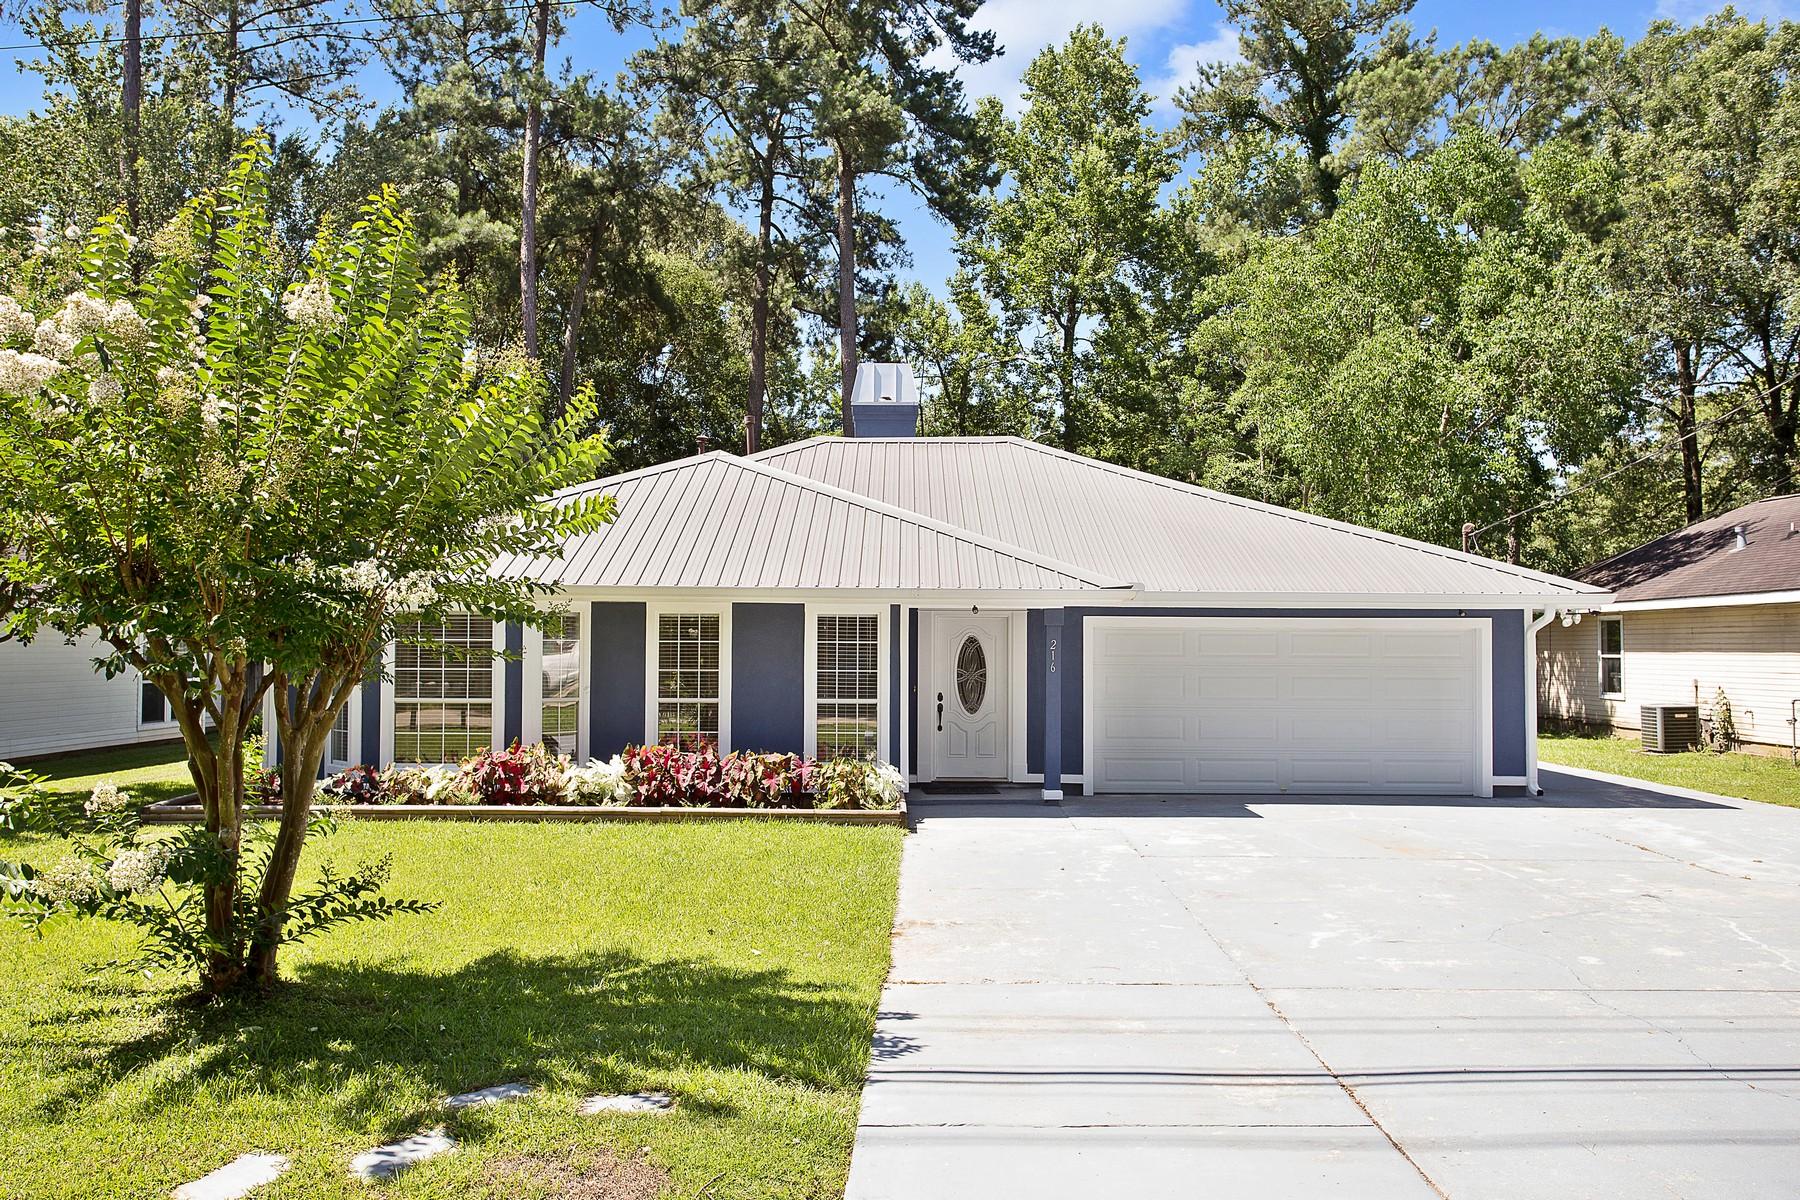 Single Family Home for Sale at 216 Beech Street, Covington Covington, Louisiana 70433 United States